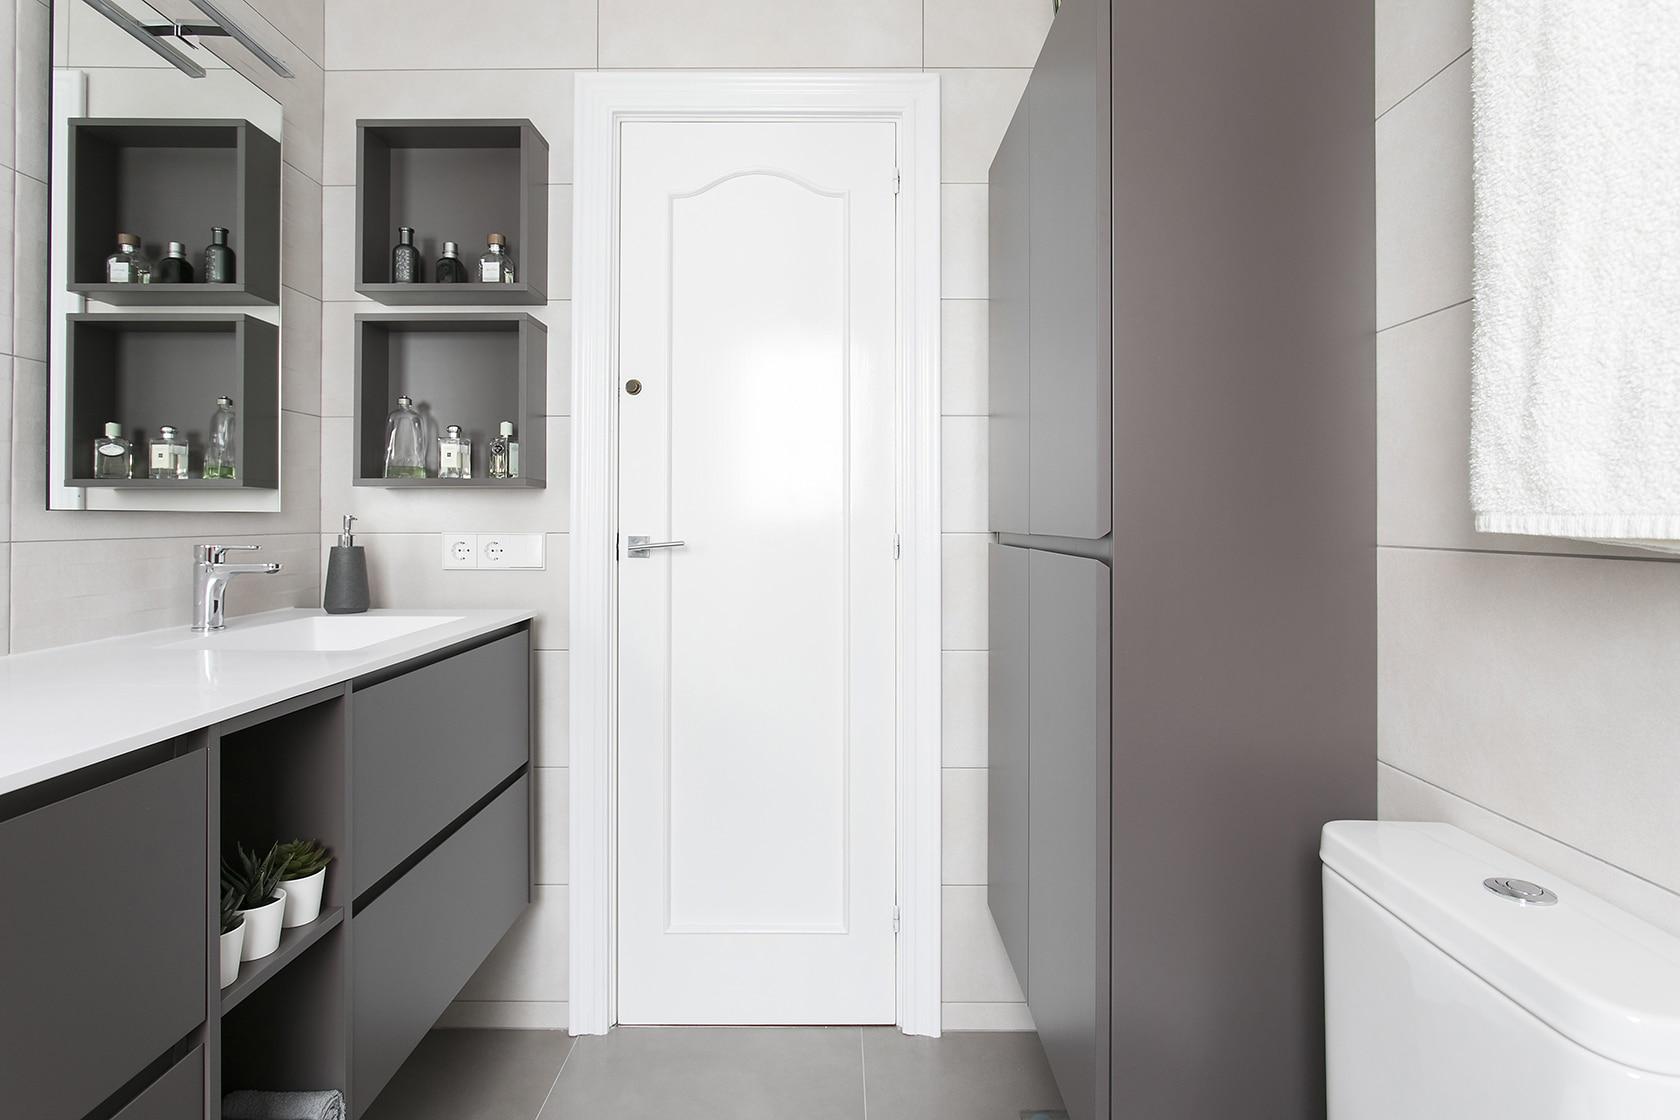 puerta del baño